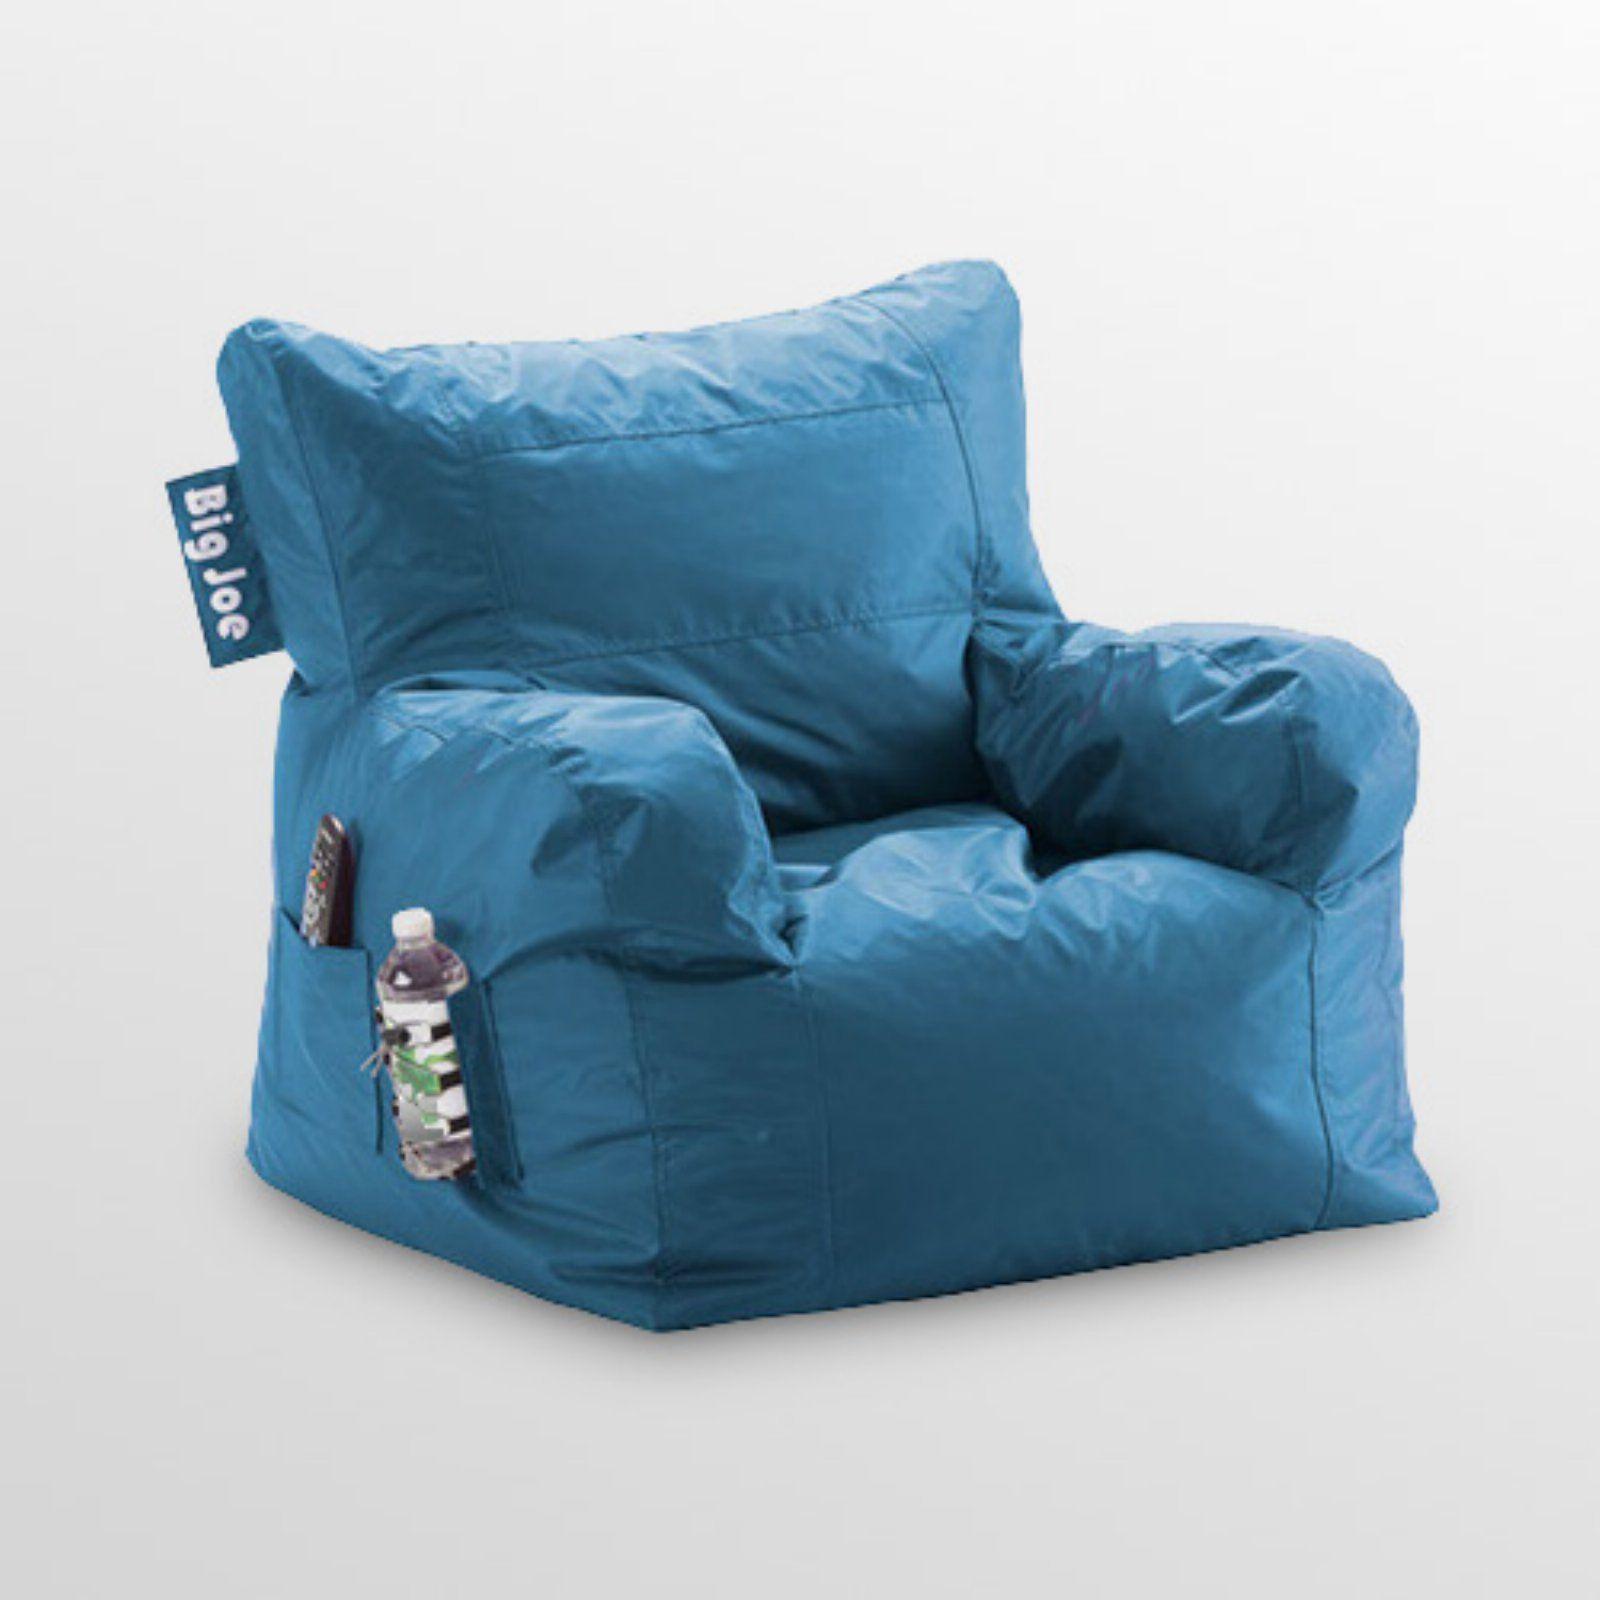 Big joe zip modular armless chair at brookstone buy now - Amazon Com Big Joe Dorm Chair Limo Black Bean Bag Chairs